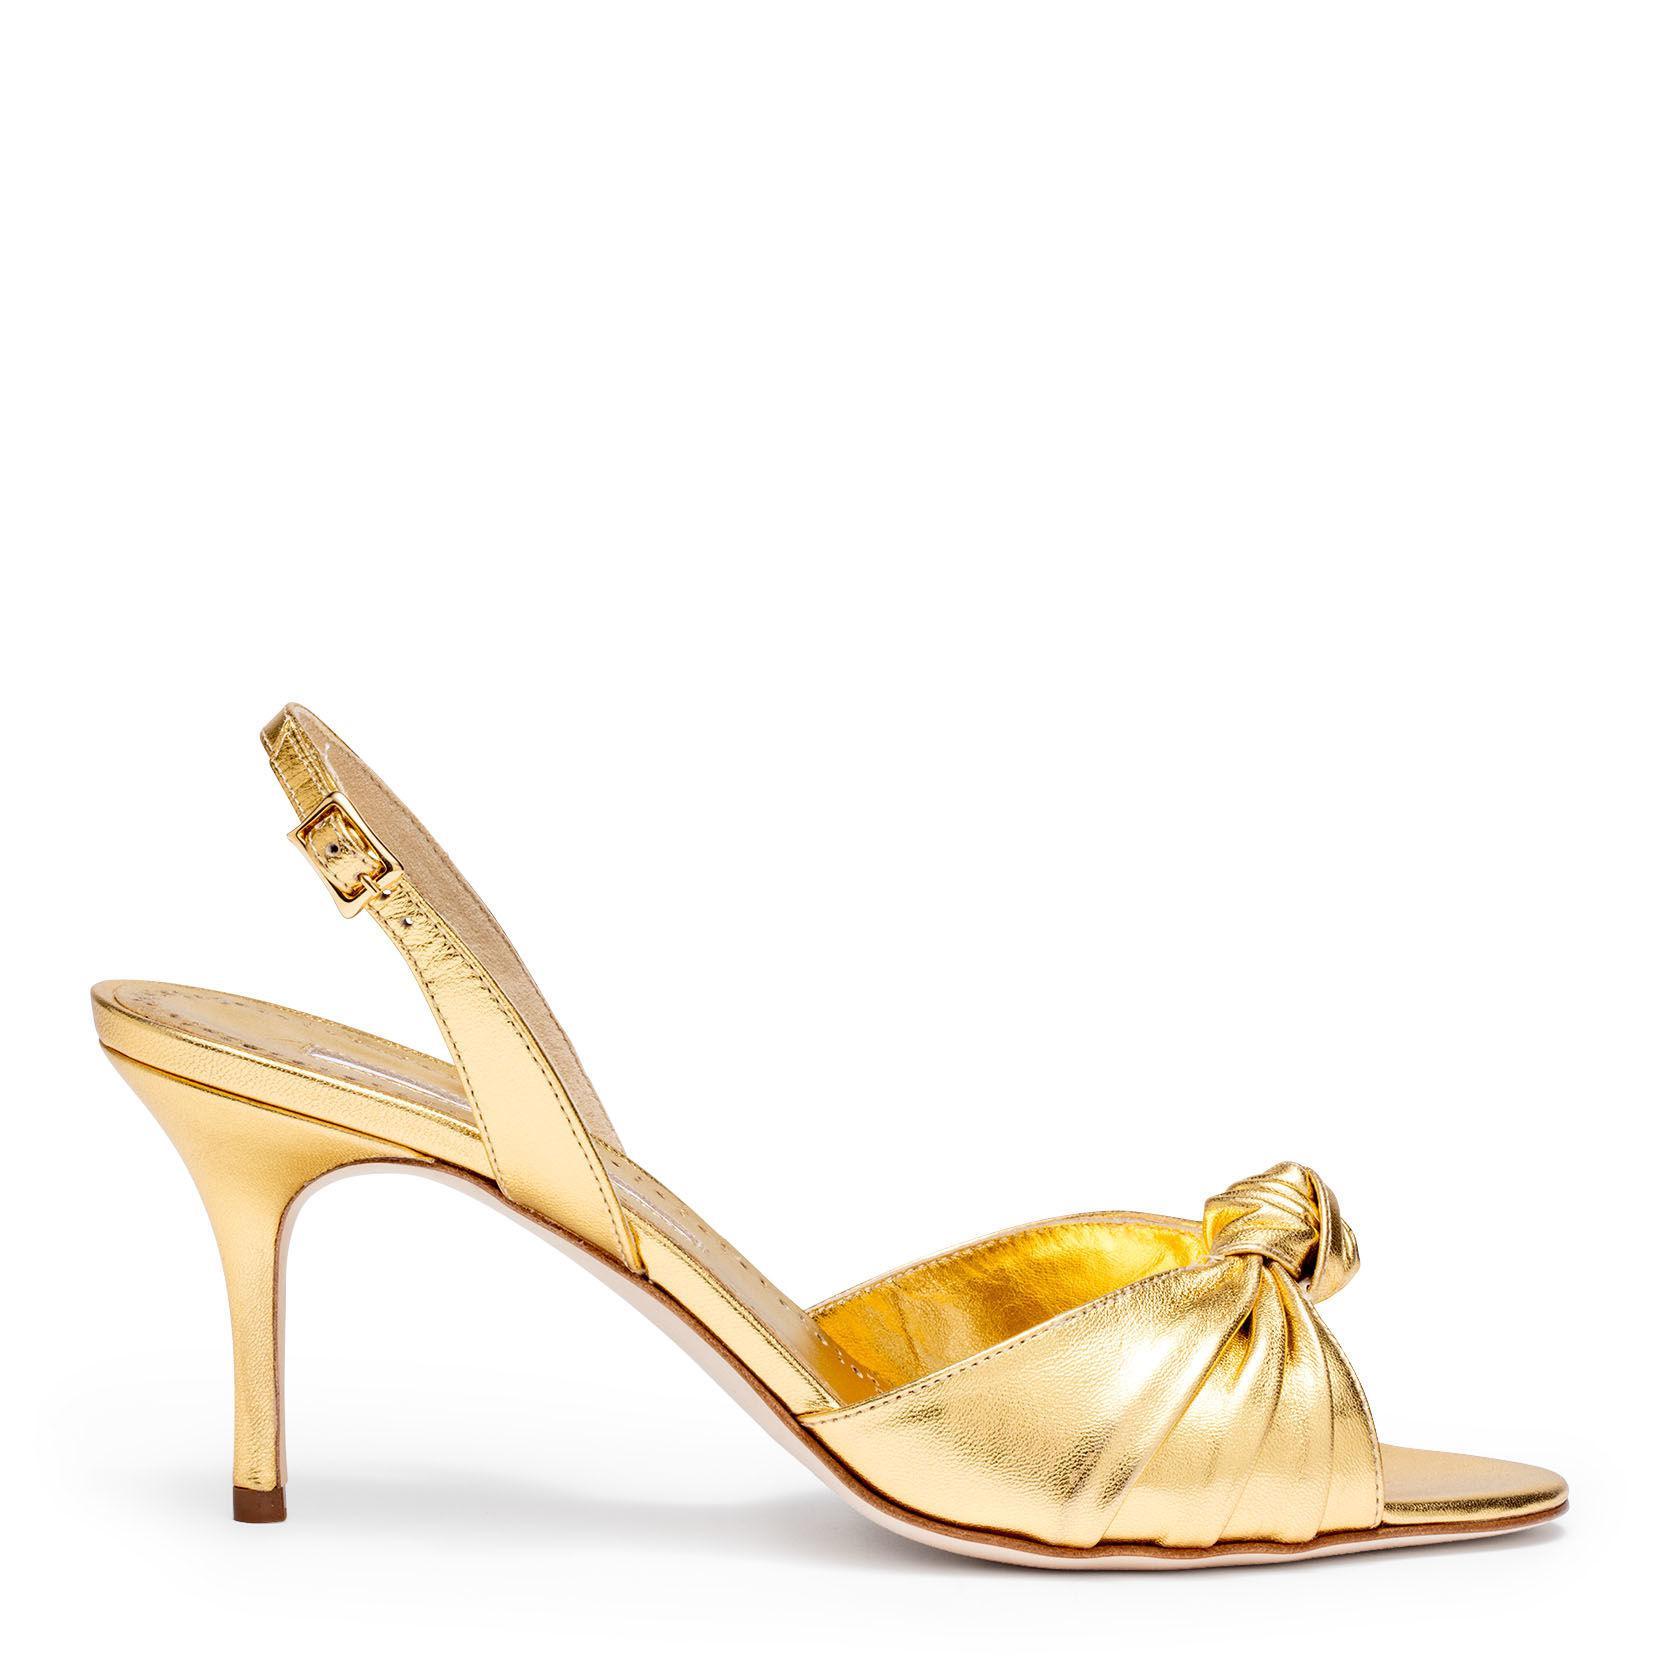 460c89aaccd Manolo Blahnik Mumuyesli 70 Nappa Light Gold Sandal in Metallic - Lyst